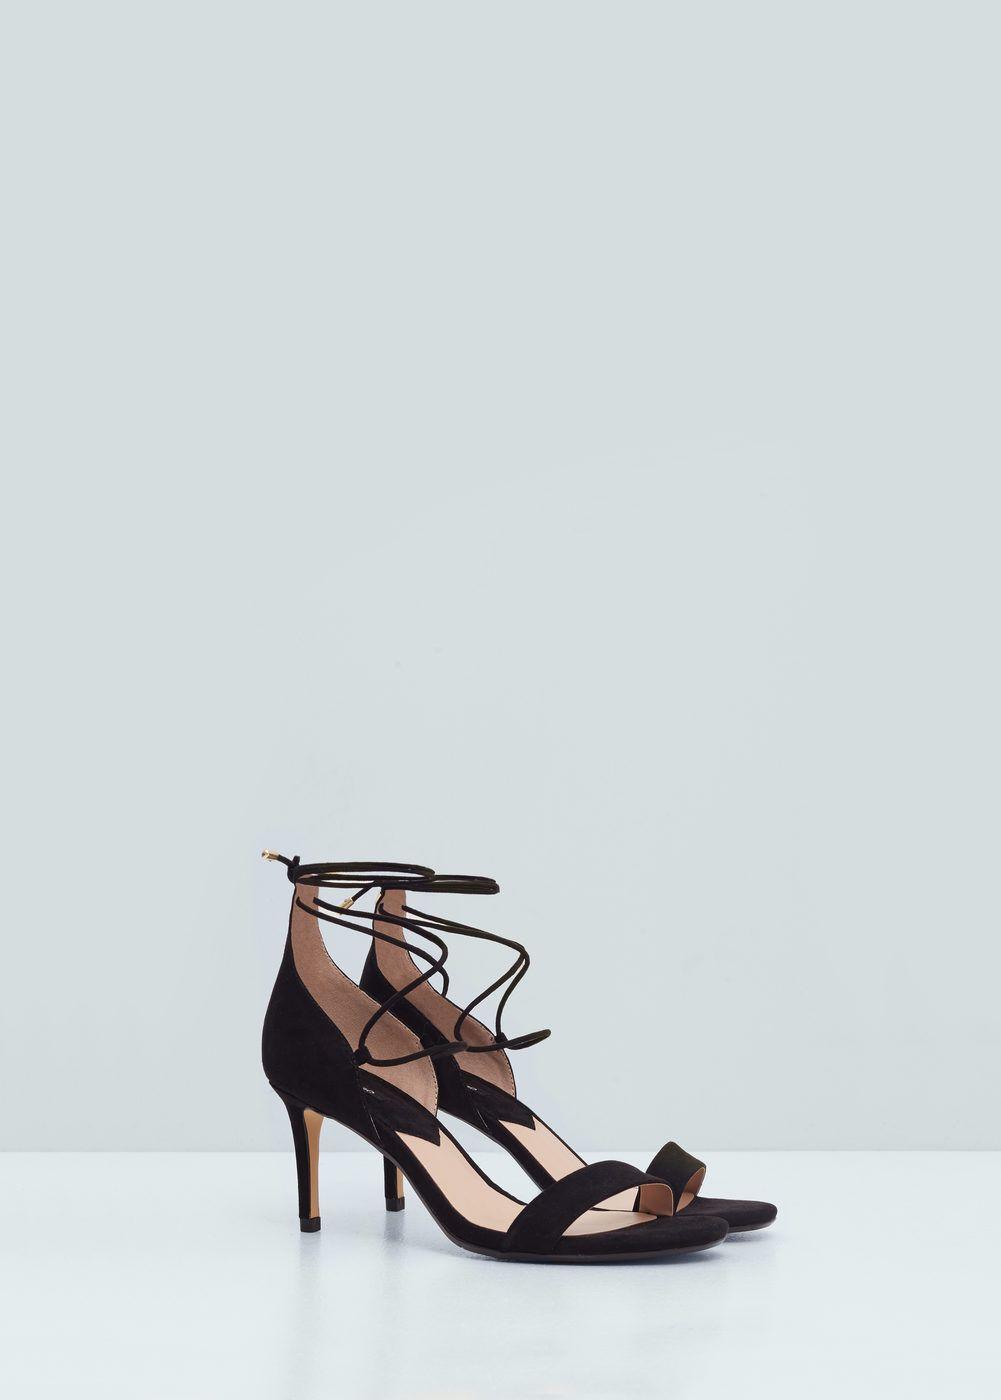 94ce7162 Sandalia atada tacón - Mujer | mango verano 2016 | Zapatos mujer ...